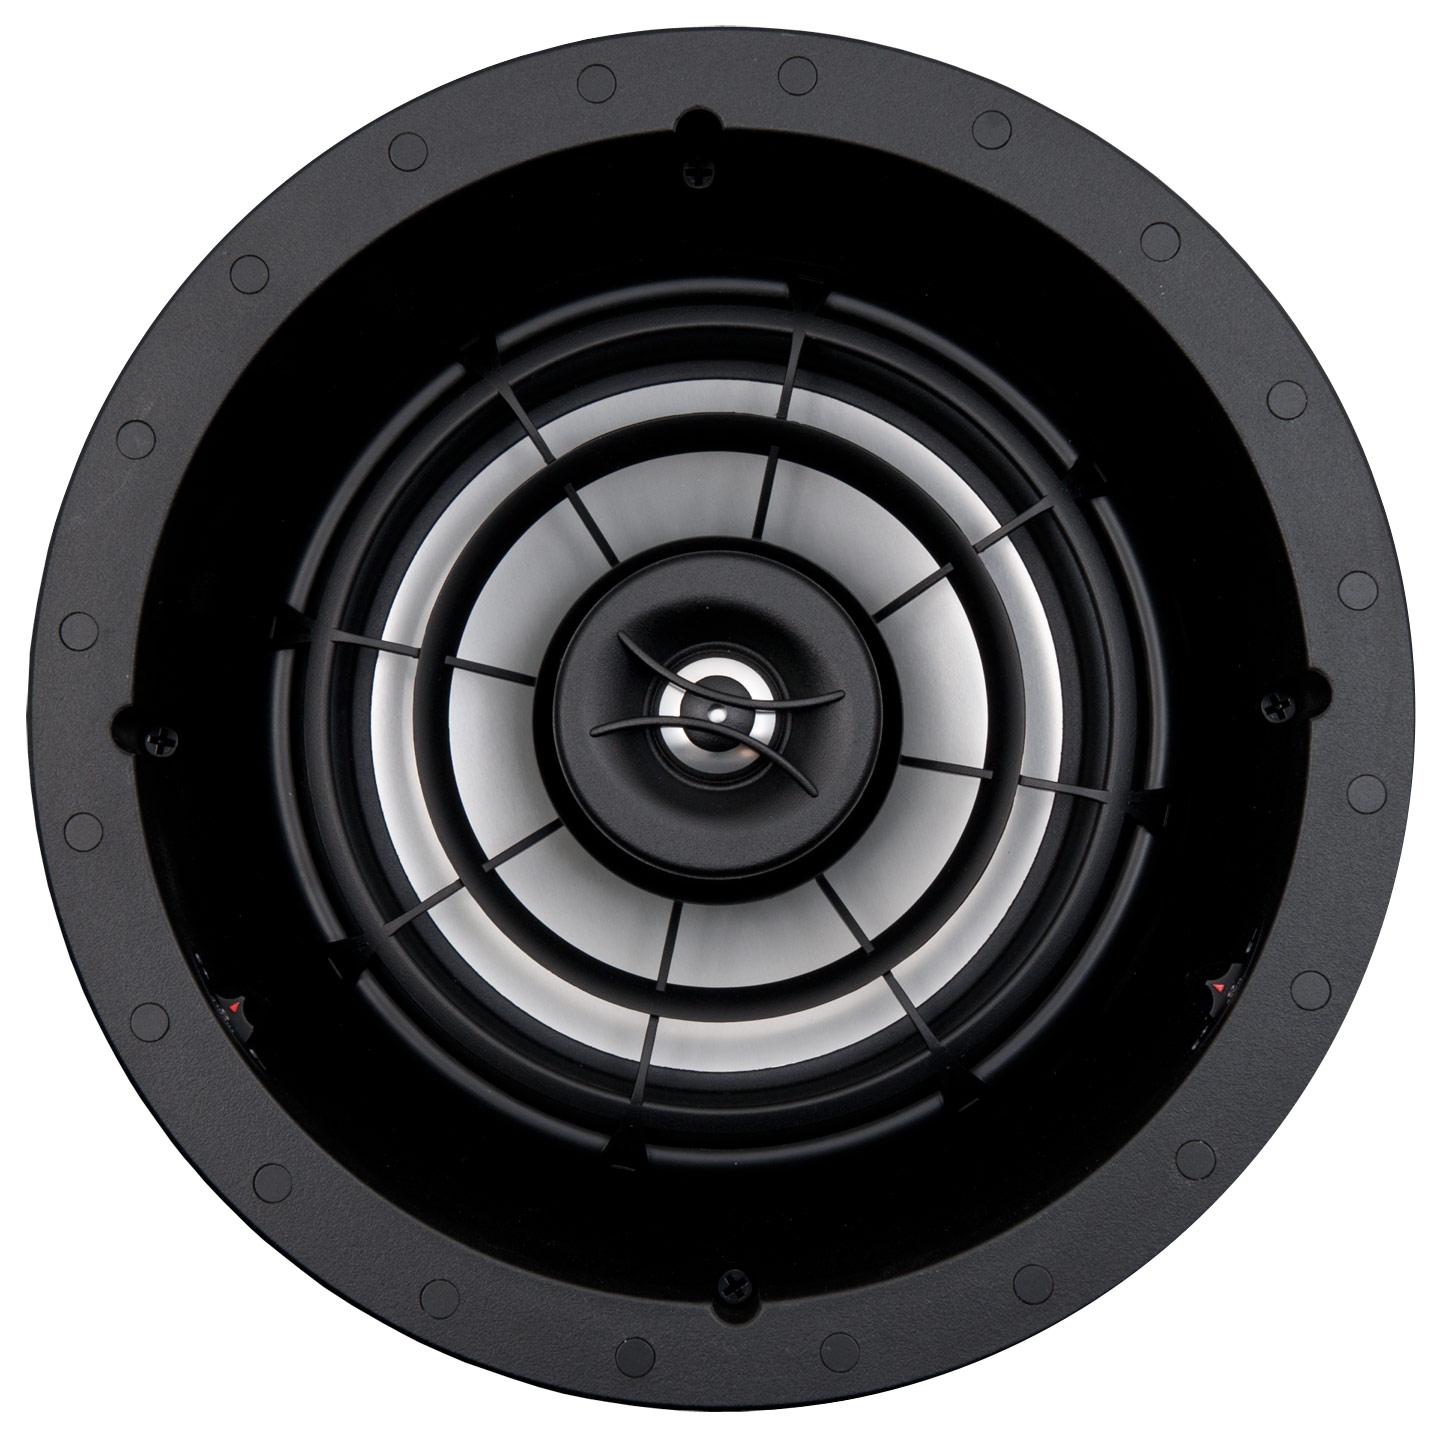 "SpeakerCraft - Profile AIM5 Three 5-1/4"" In-Ceiling Speaker (Each) - Black"